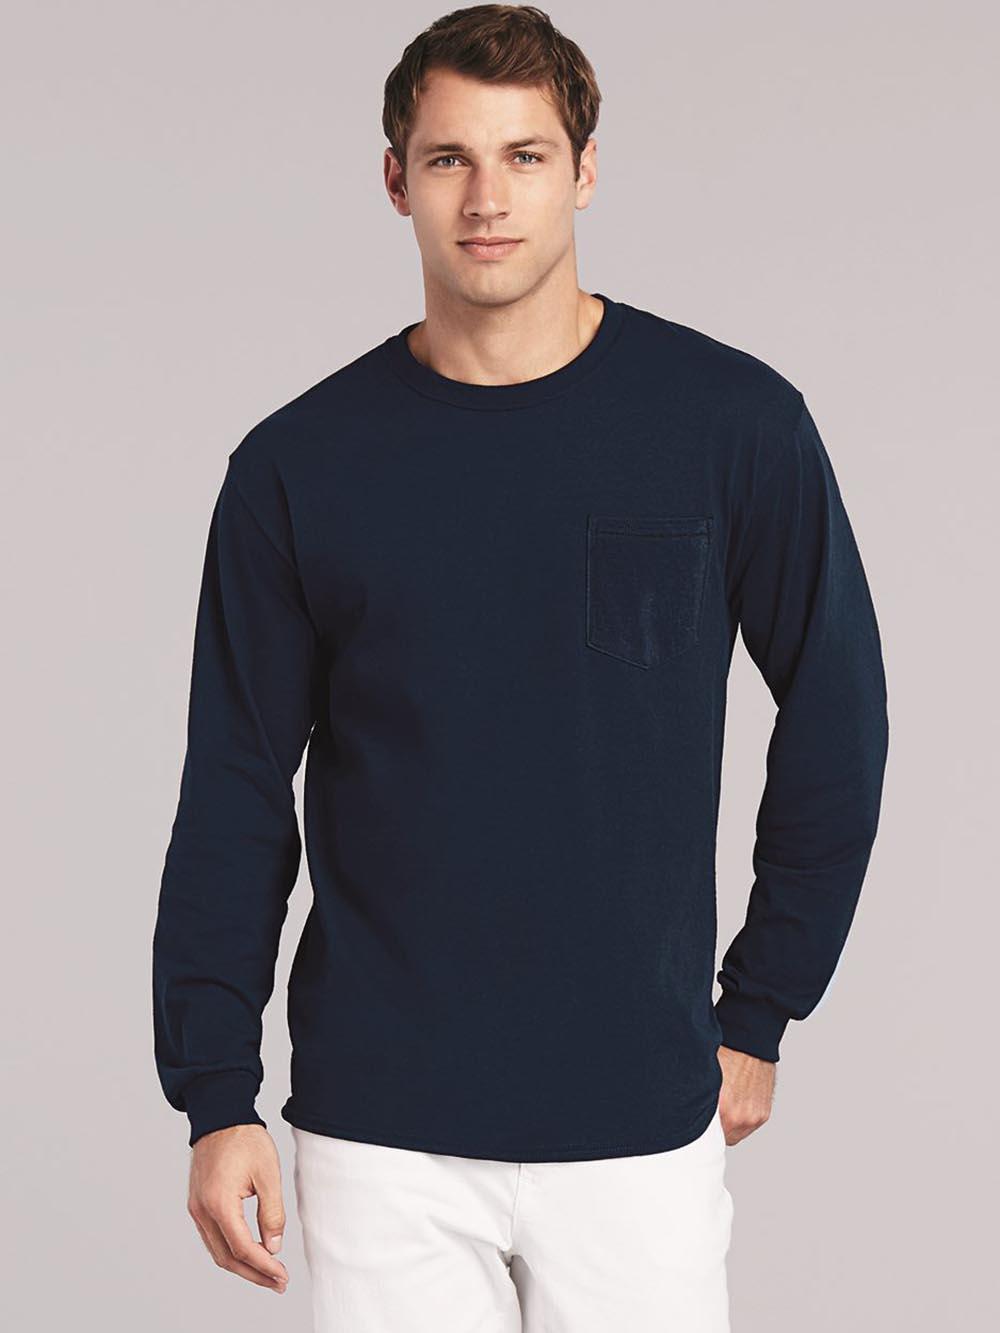 49796e9ec35 Gildan - Ultra Cotton Long Sleeve T-Shirt with a Pocket - 2410